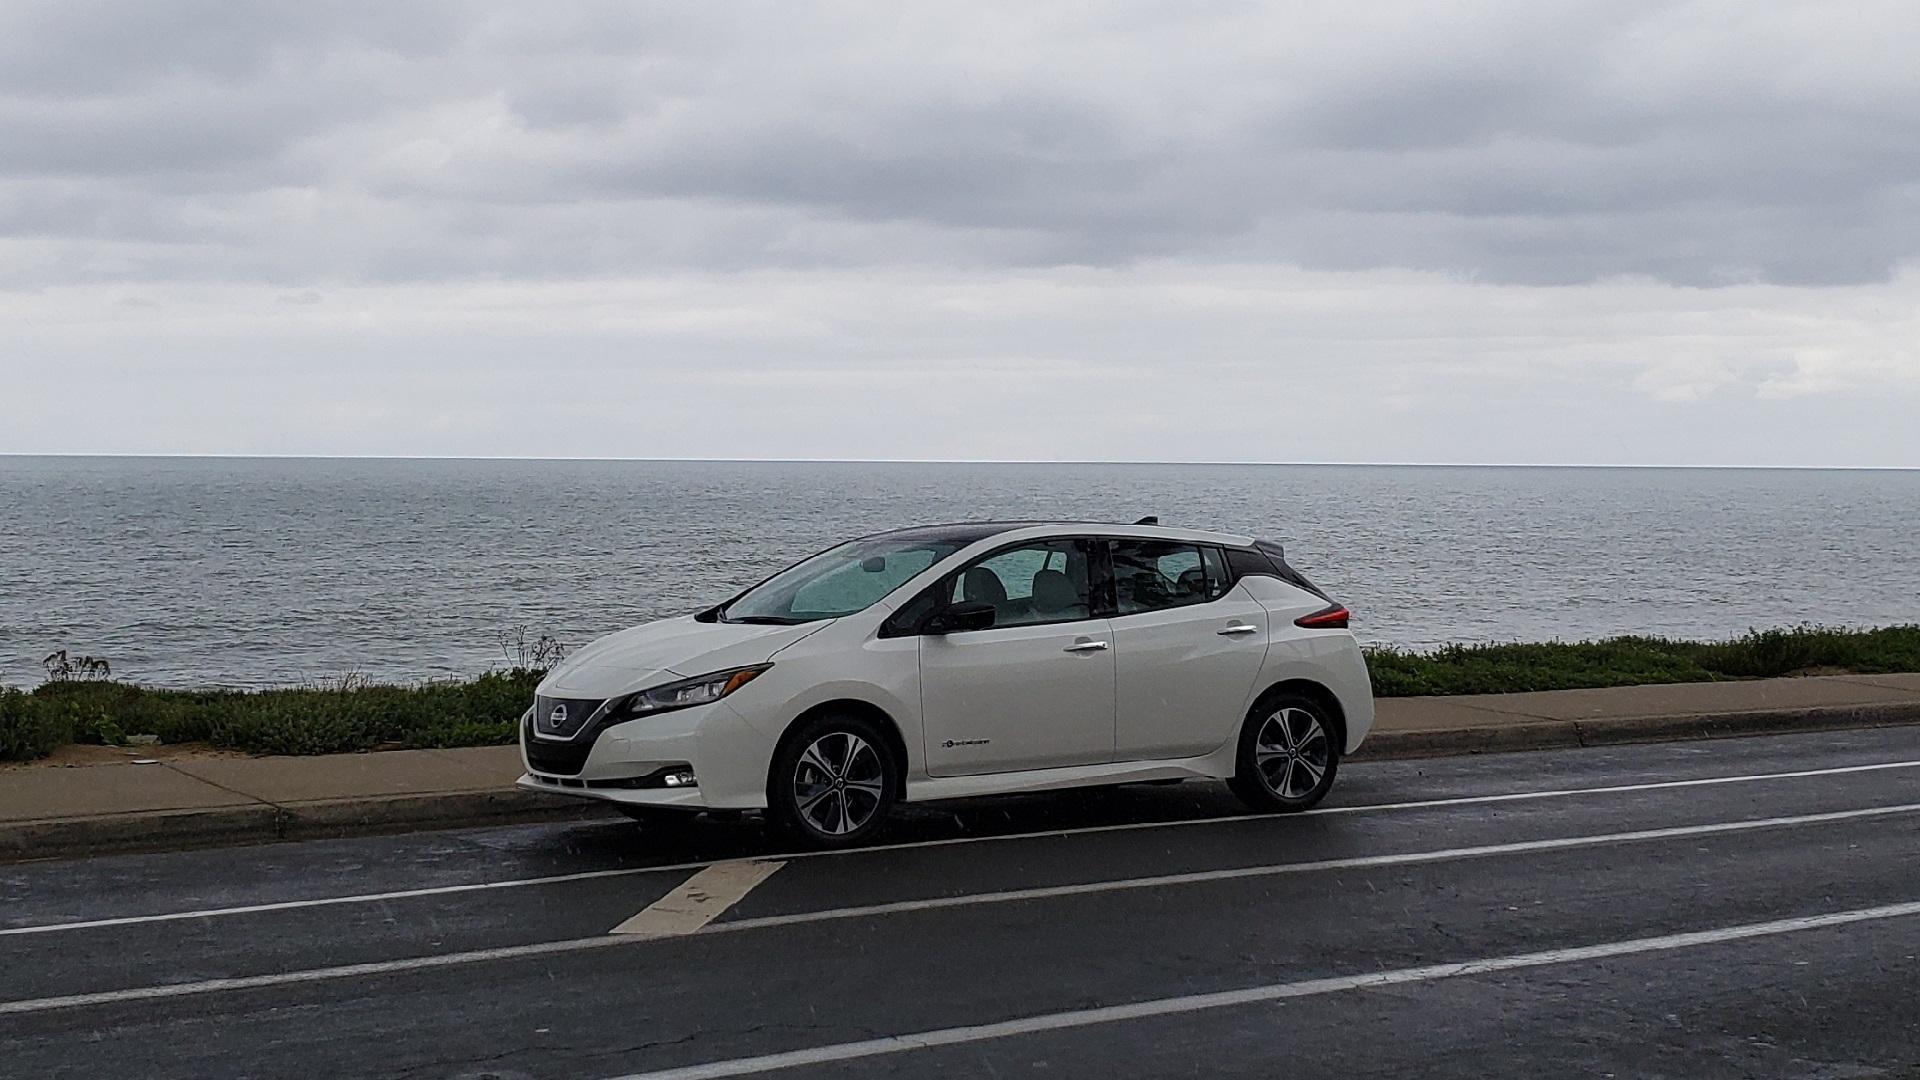 2019 Nissan Leaf Plus, San Diego area, Feb 2019